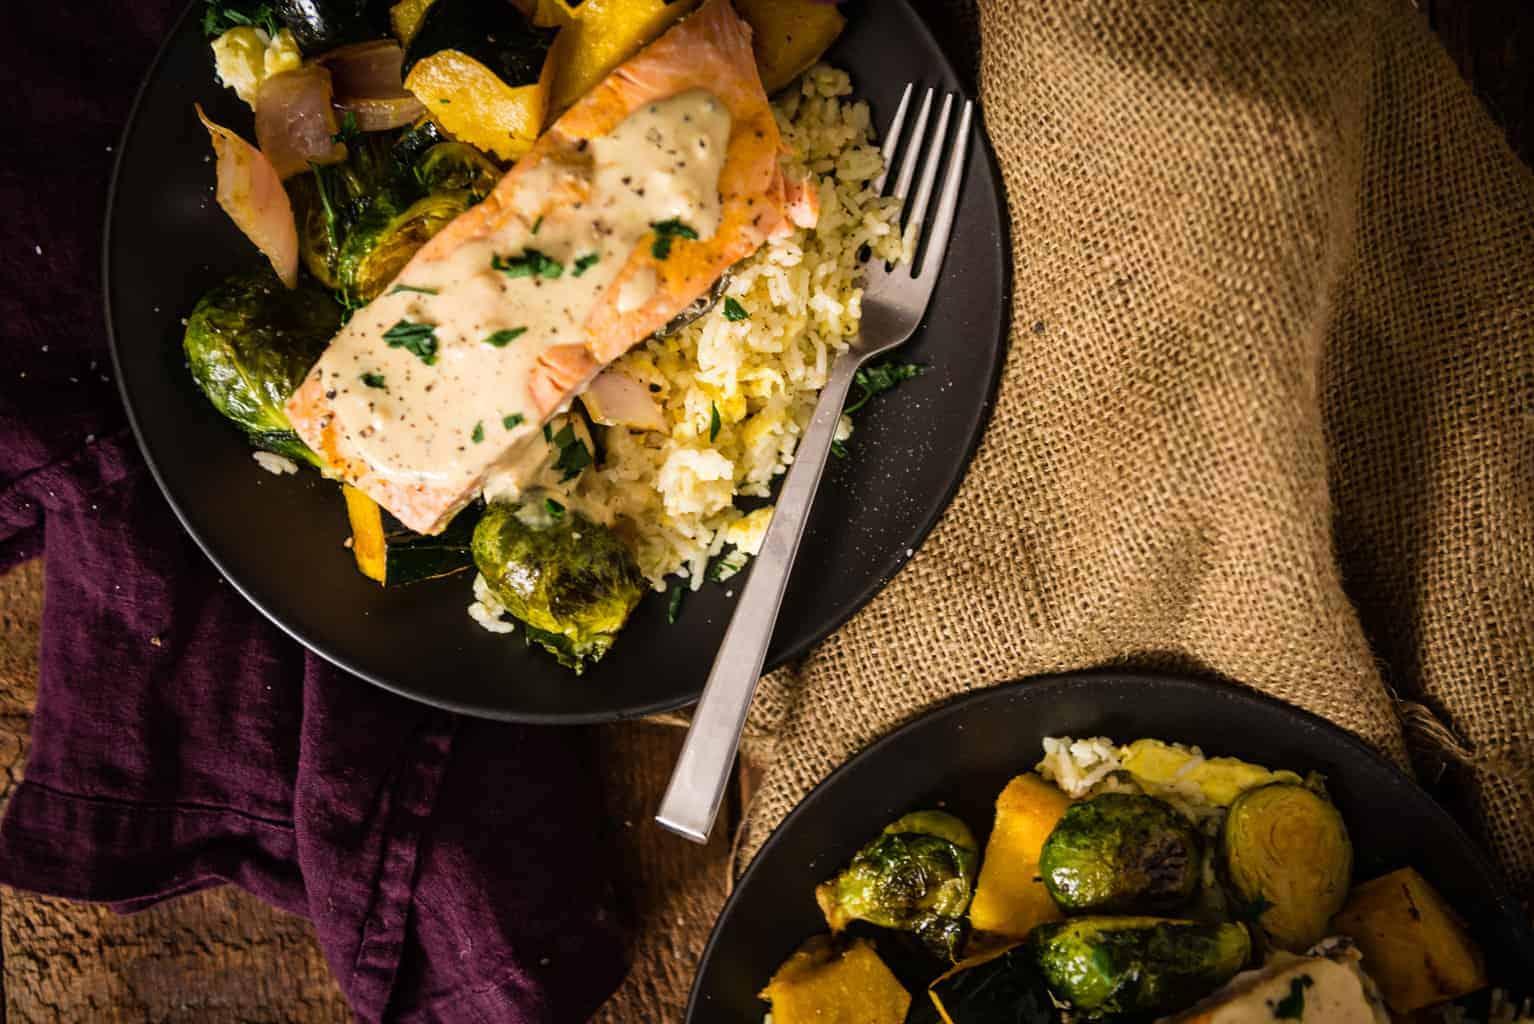 Curry Roasted Salmon & Veggies With Tahini Sauce over Basmati | Kita Roberts PassTheSushi.com